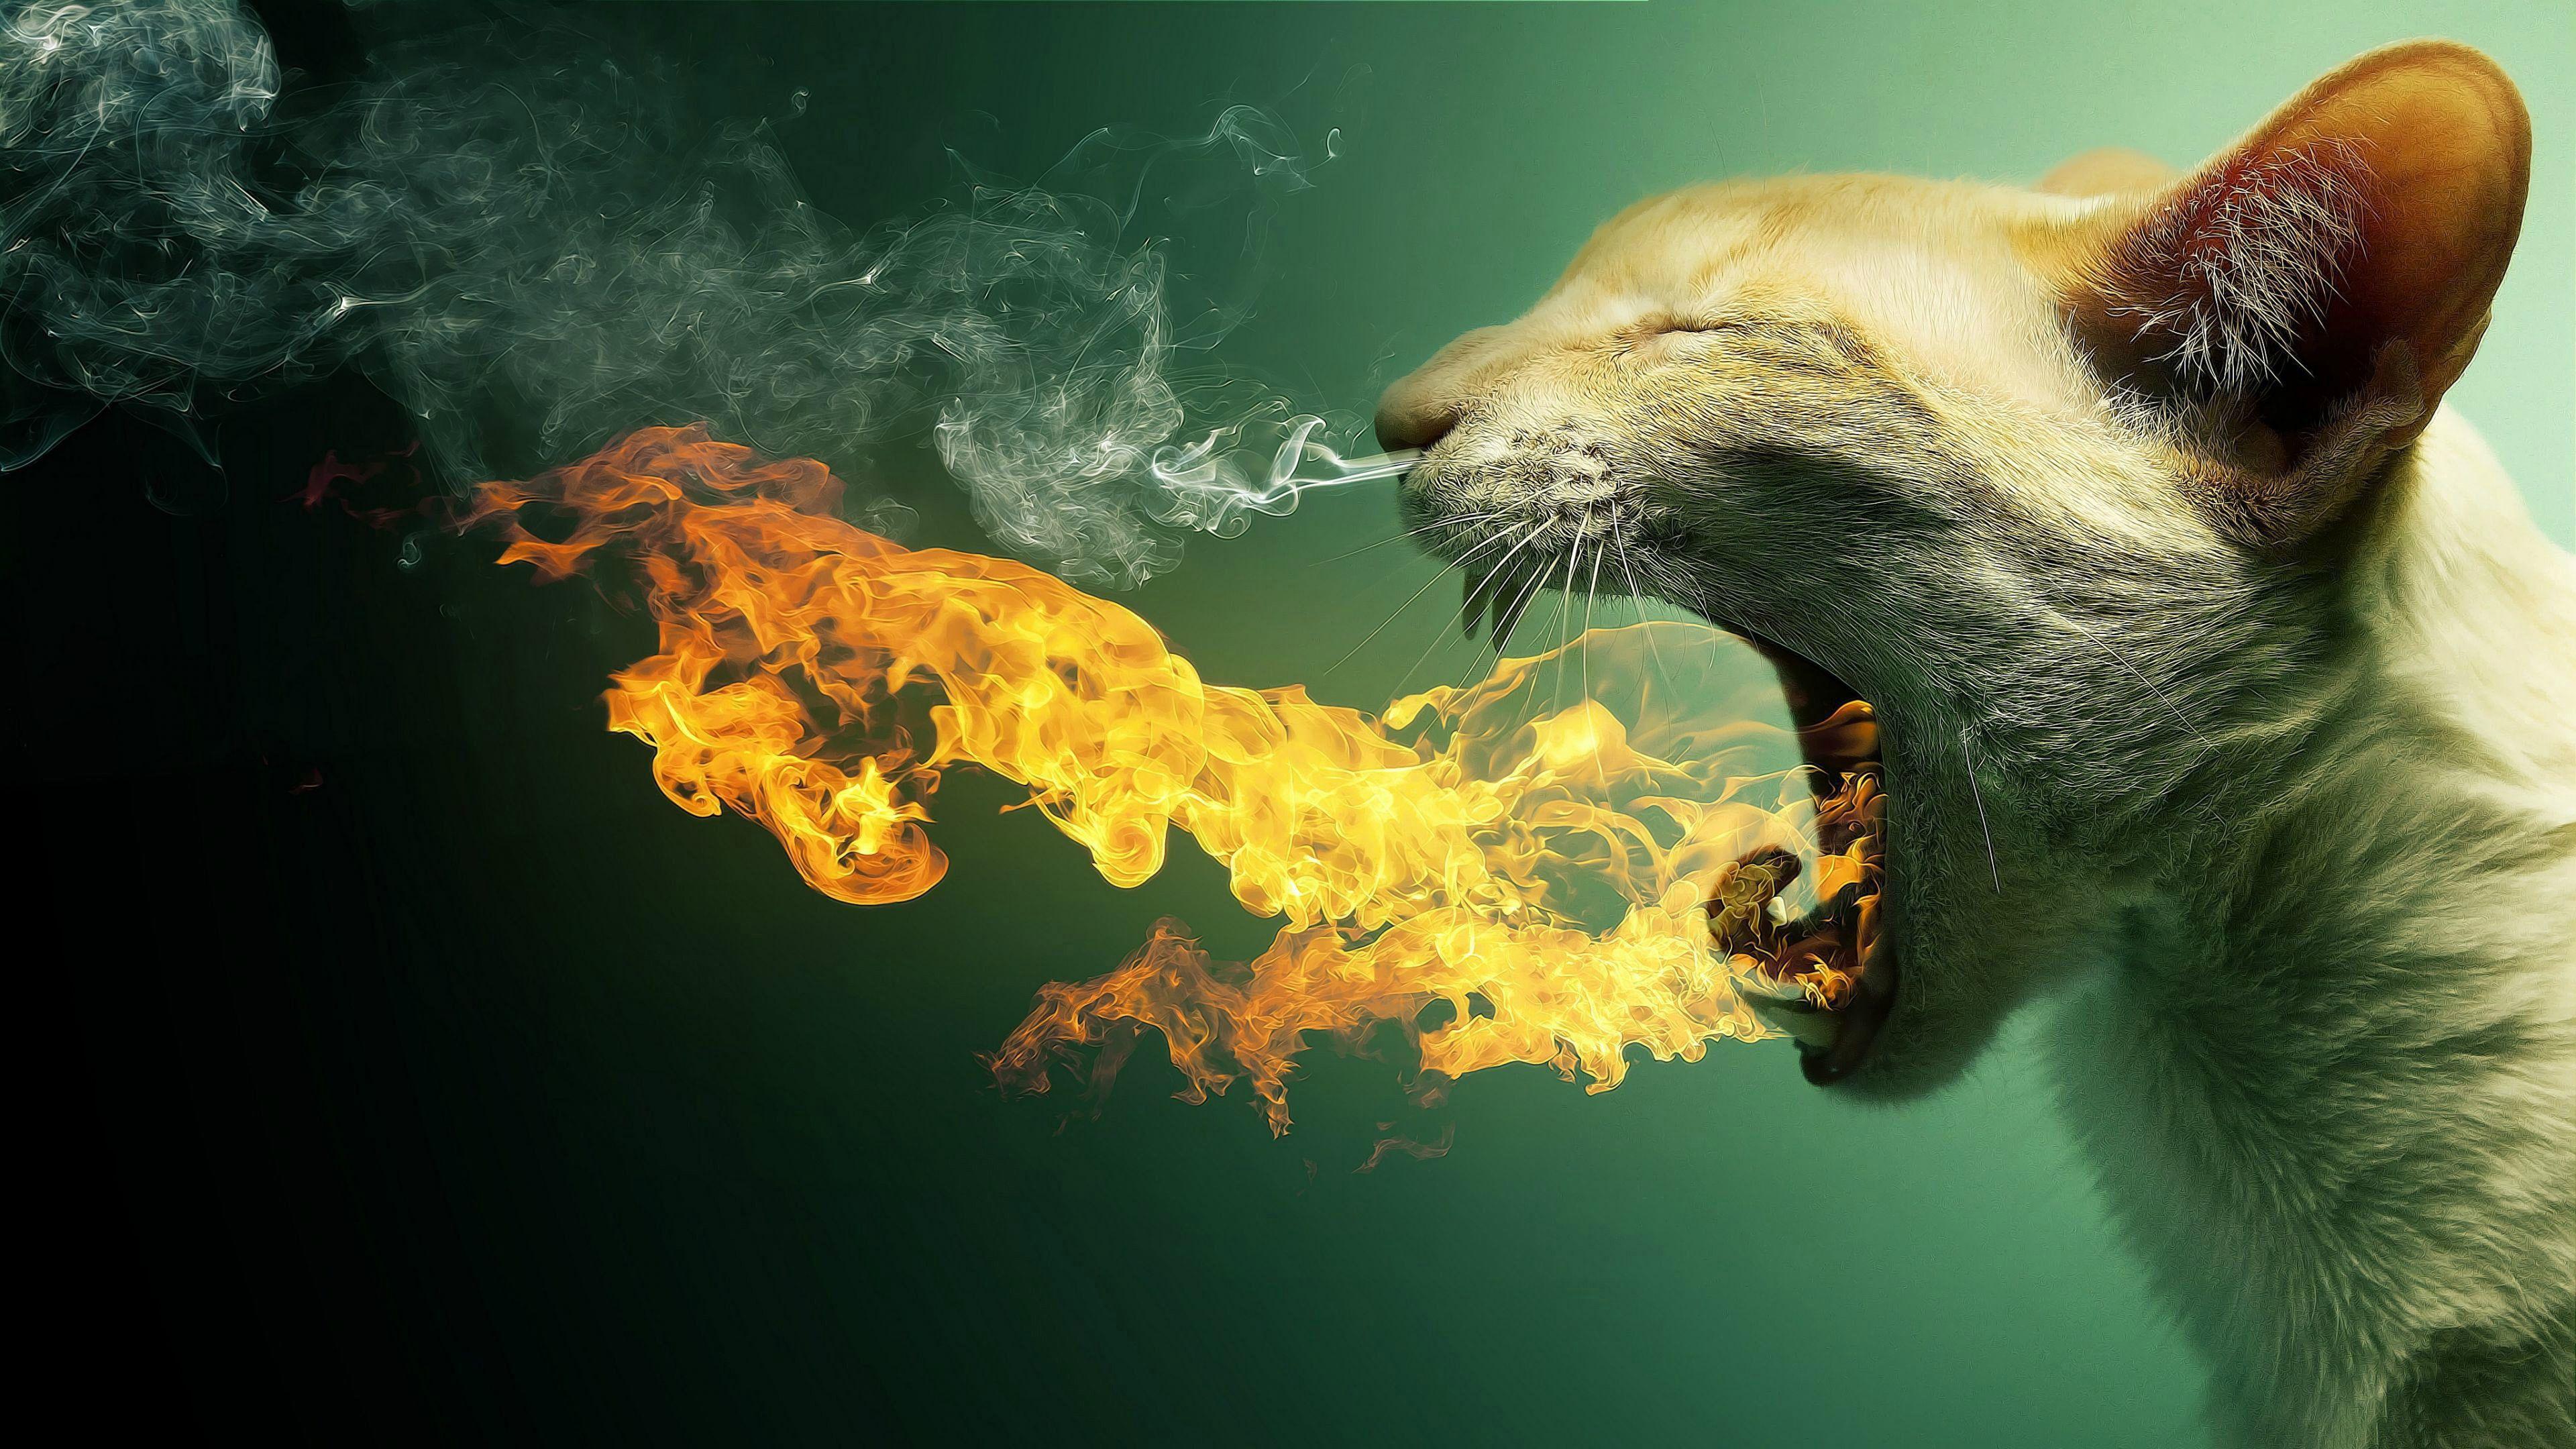 Animal Silhouette Art Design Symbol Cat Fire Light Digital Art Funny Smoke Flame 4k Wallpaper Hdw Cat Wallpaper Hd Wallpapers For Pc Wallpaper Pc